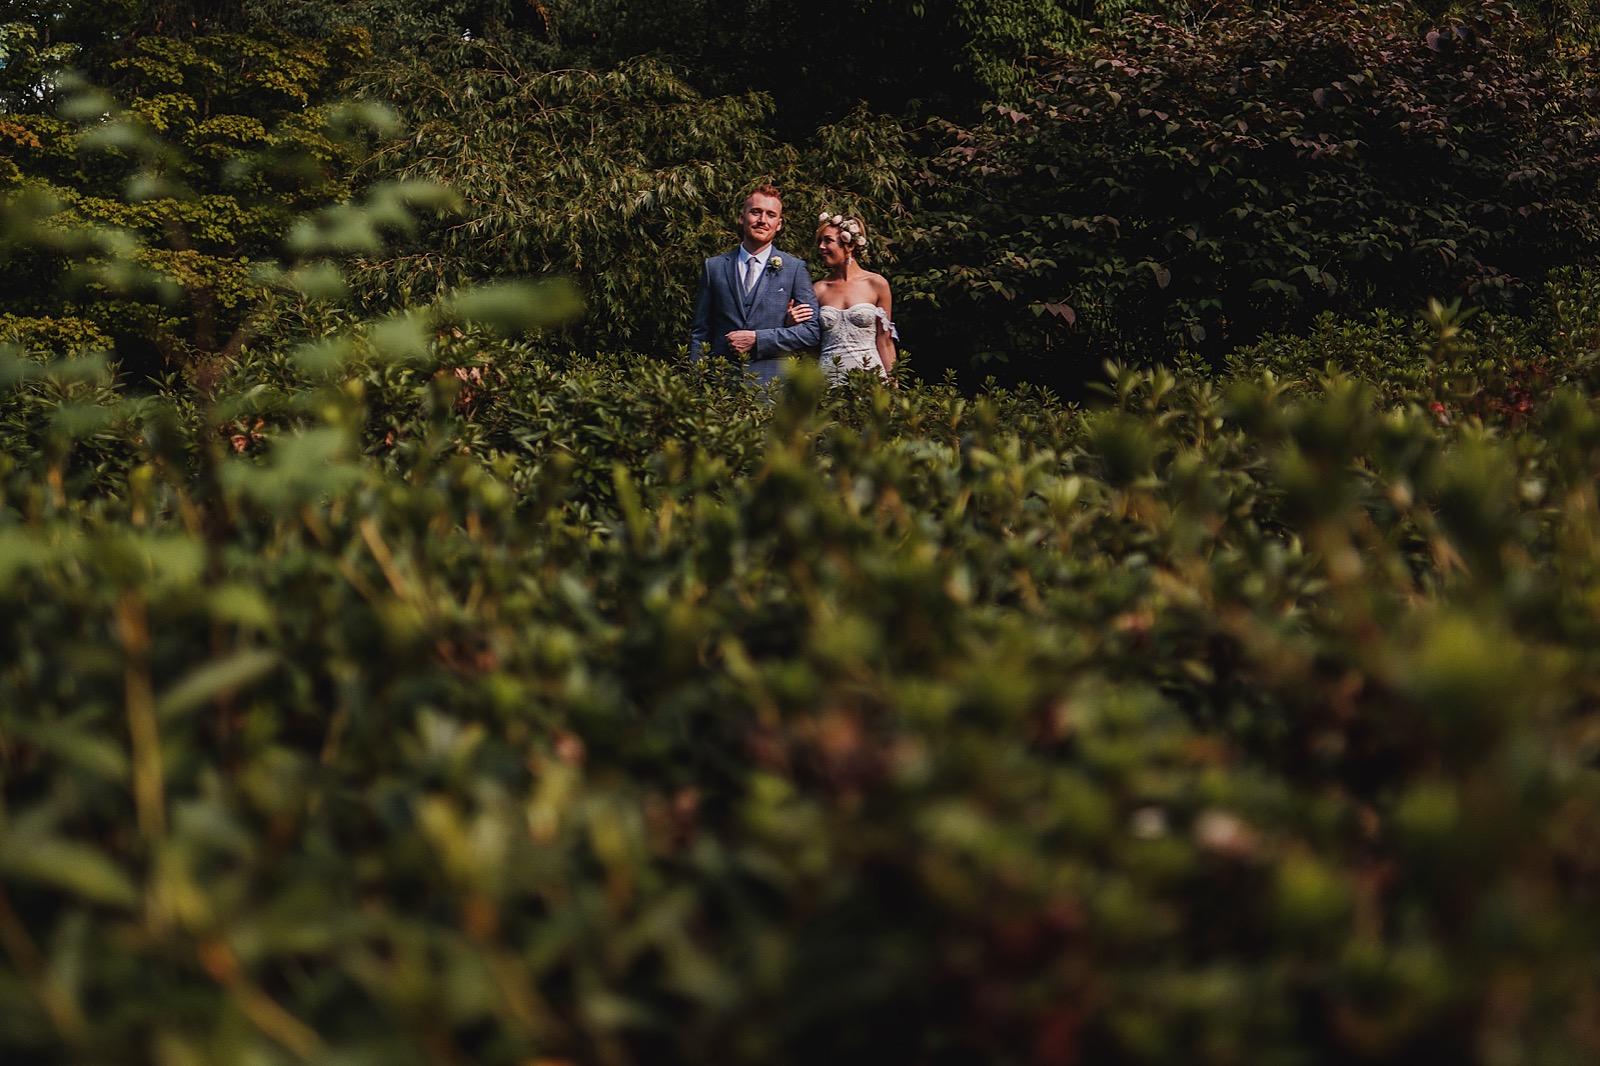 Bride & Groom captured amongst greenery